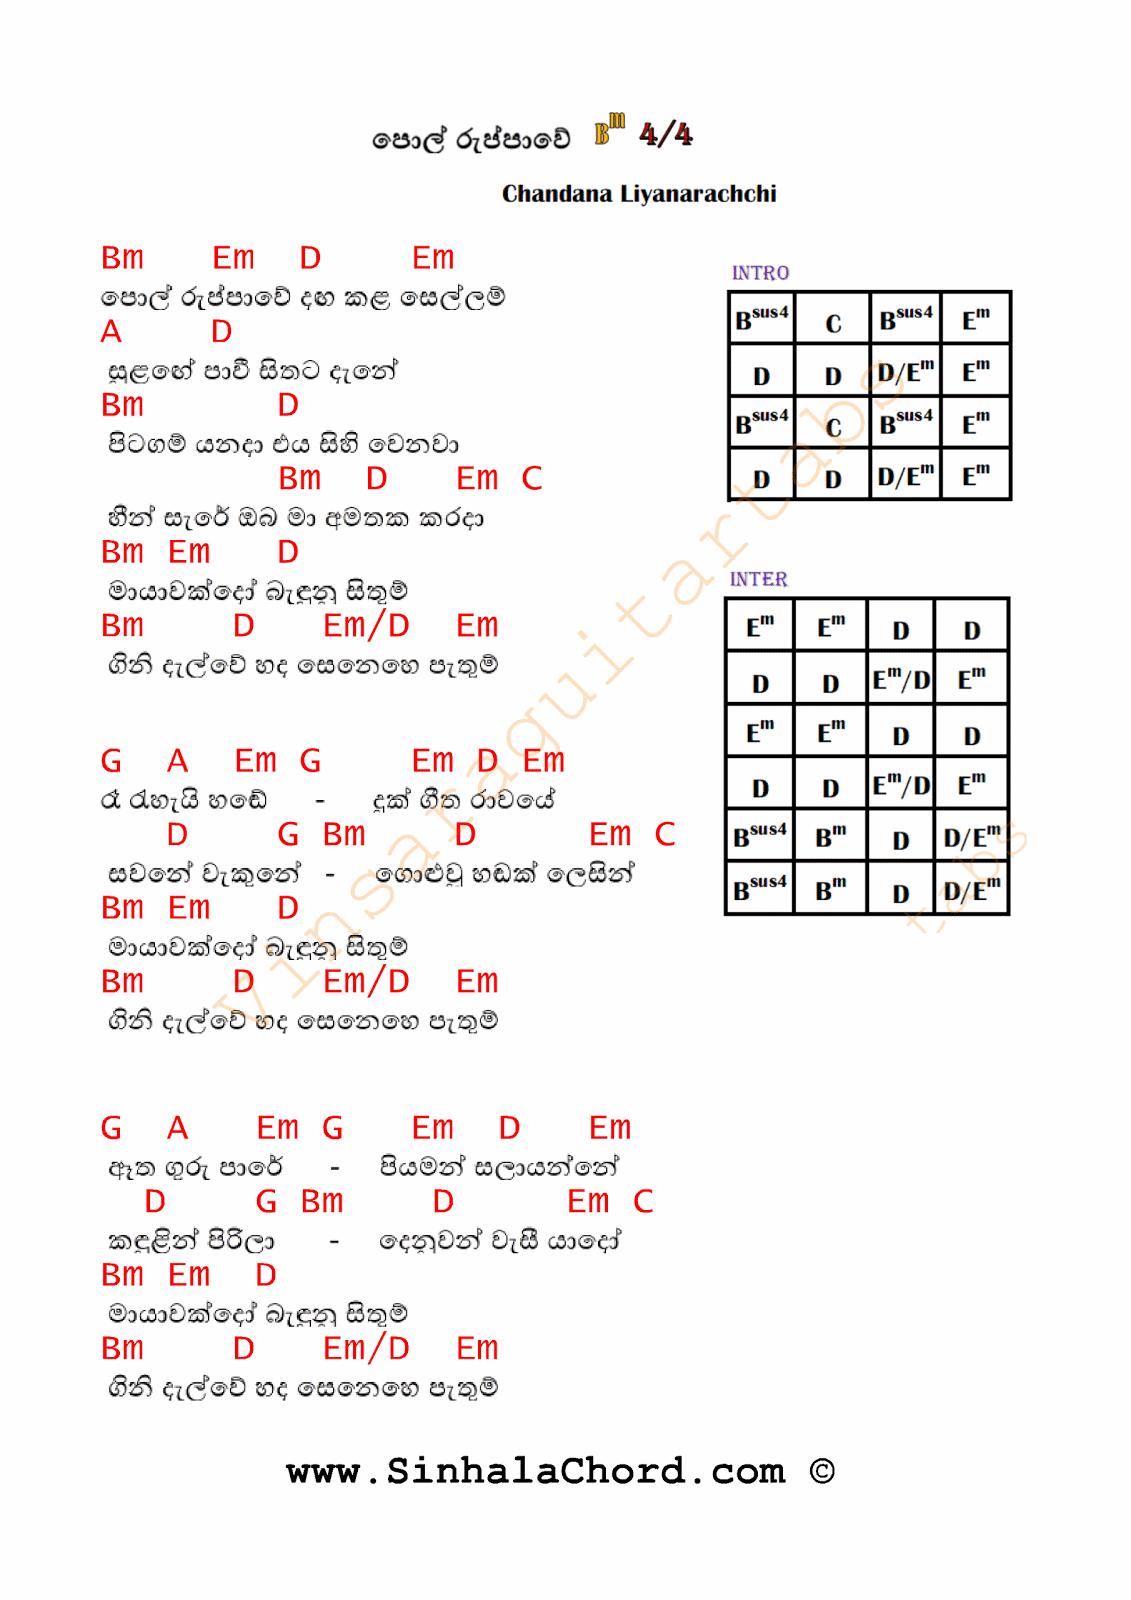 Polruppawe - Guitar Chords ( Chandana Liyanarachchi ) : Sinhala Guitar Chords:Sinhala Songs ...